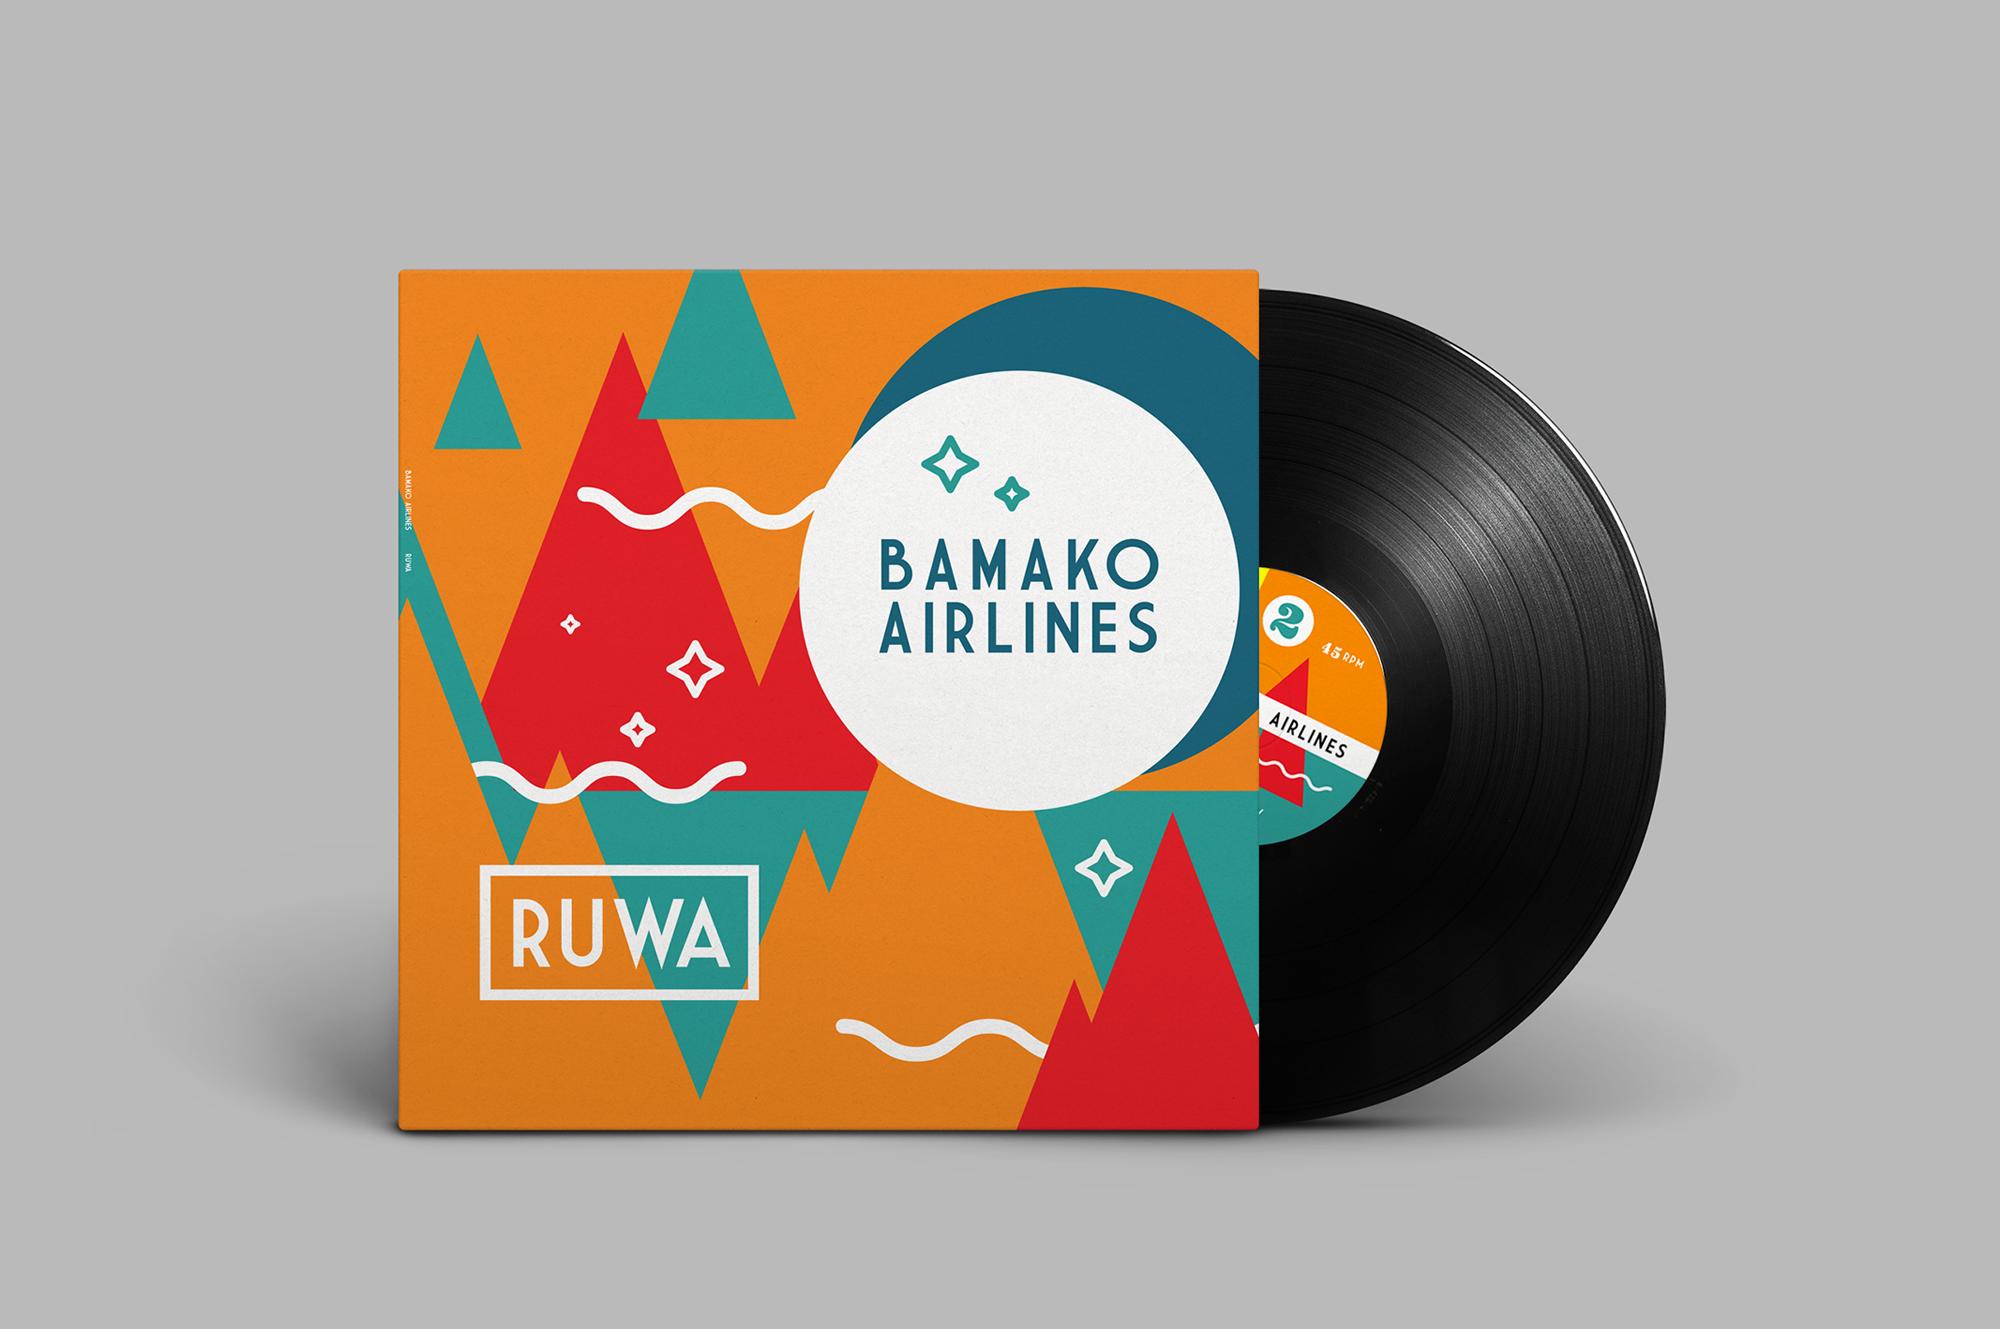 bamakoairlines_album